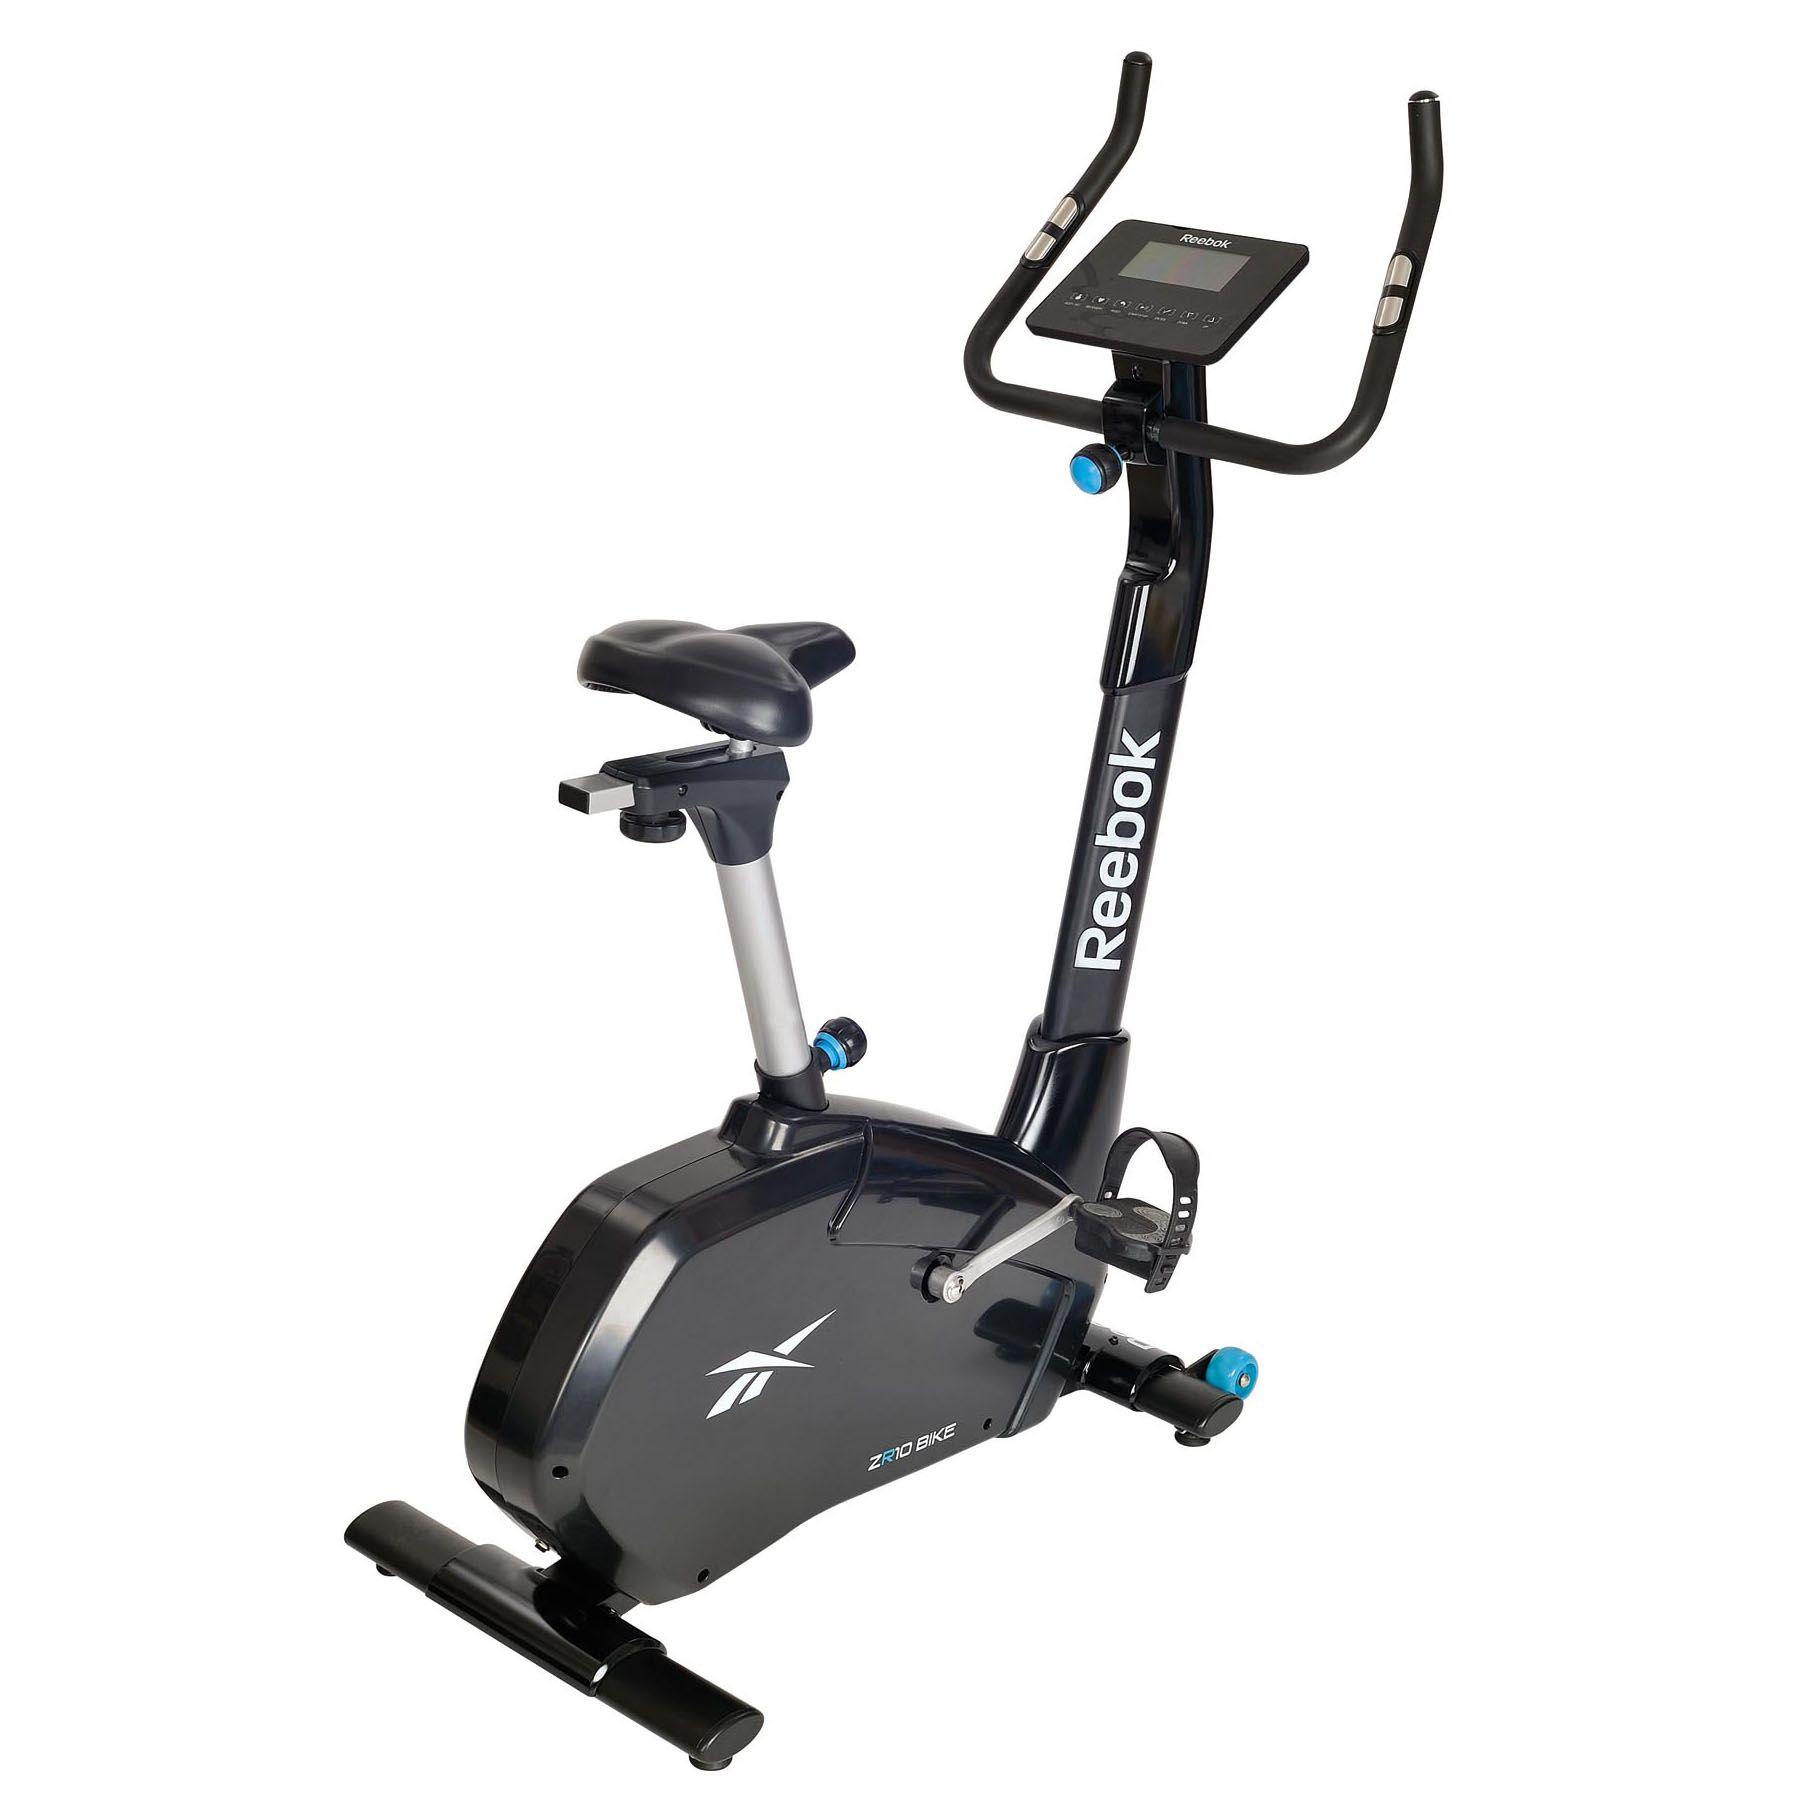 Reebok Zr10 Exercise Bike Review